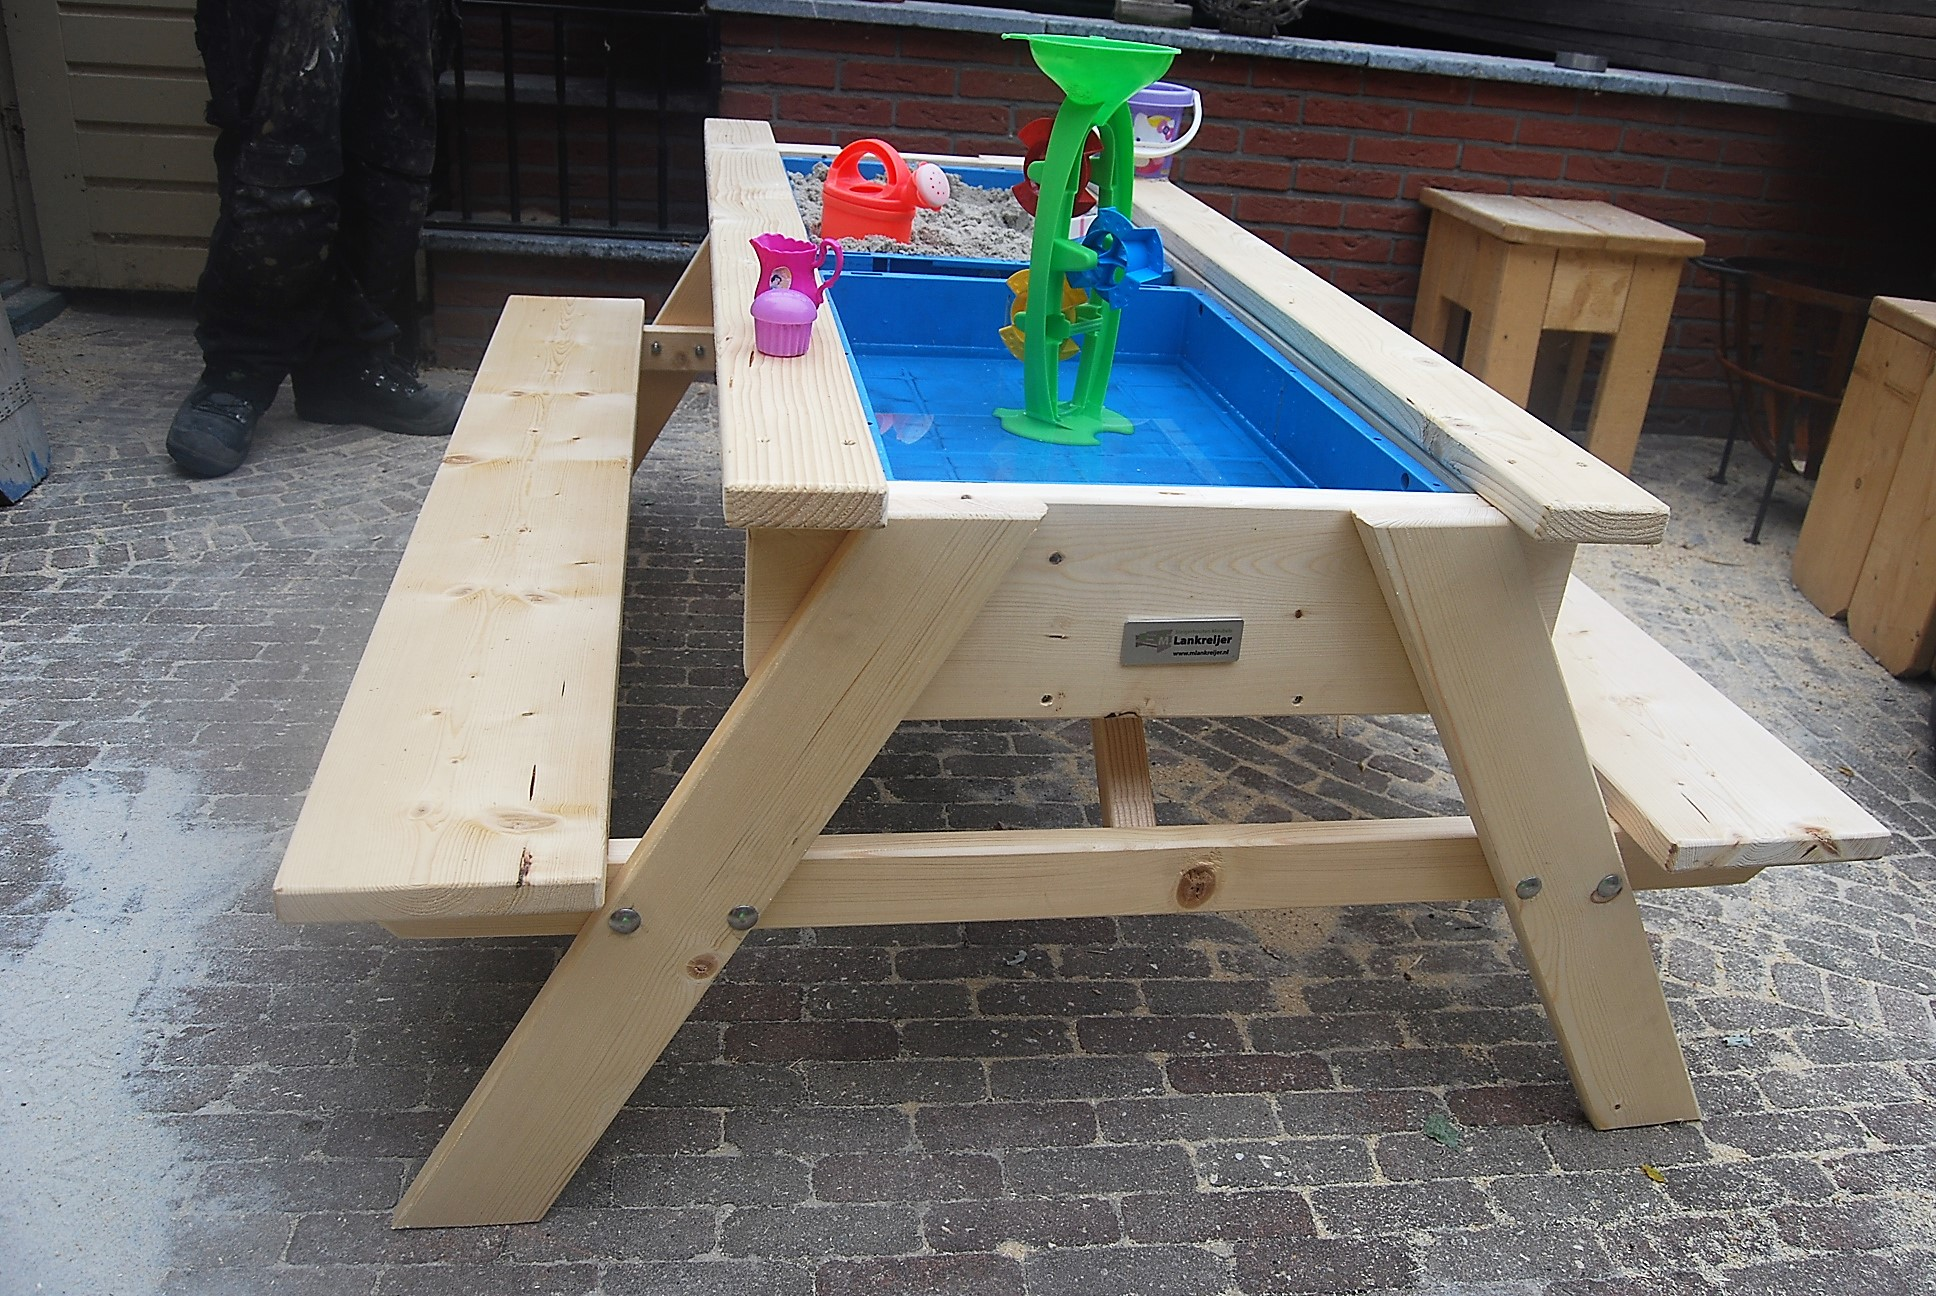 Zand En Watertafel Ook In Picknick Uitvoering Lankreijer